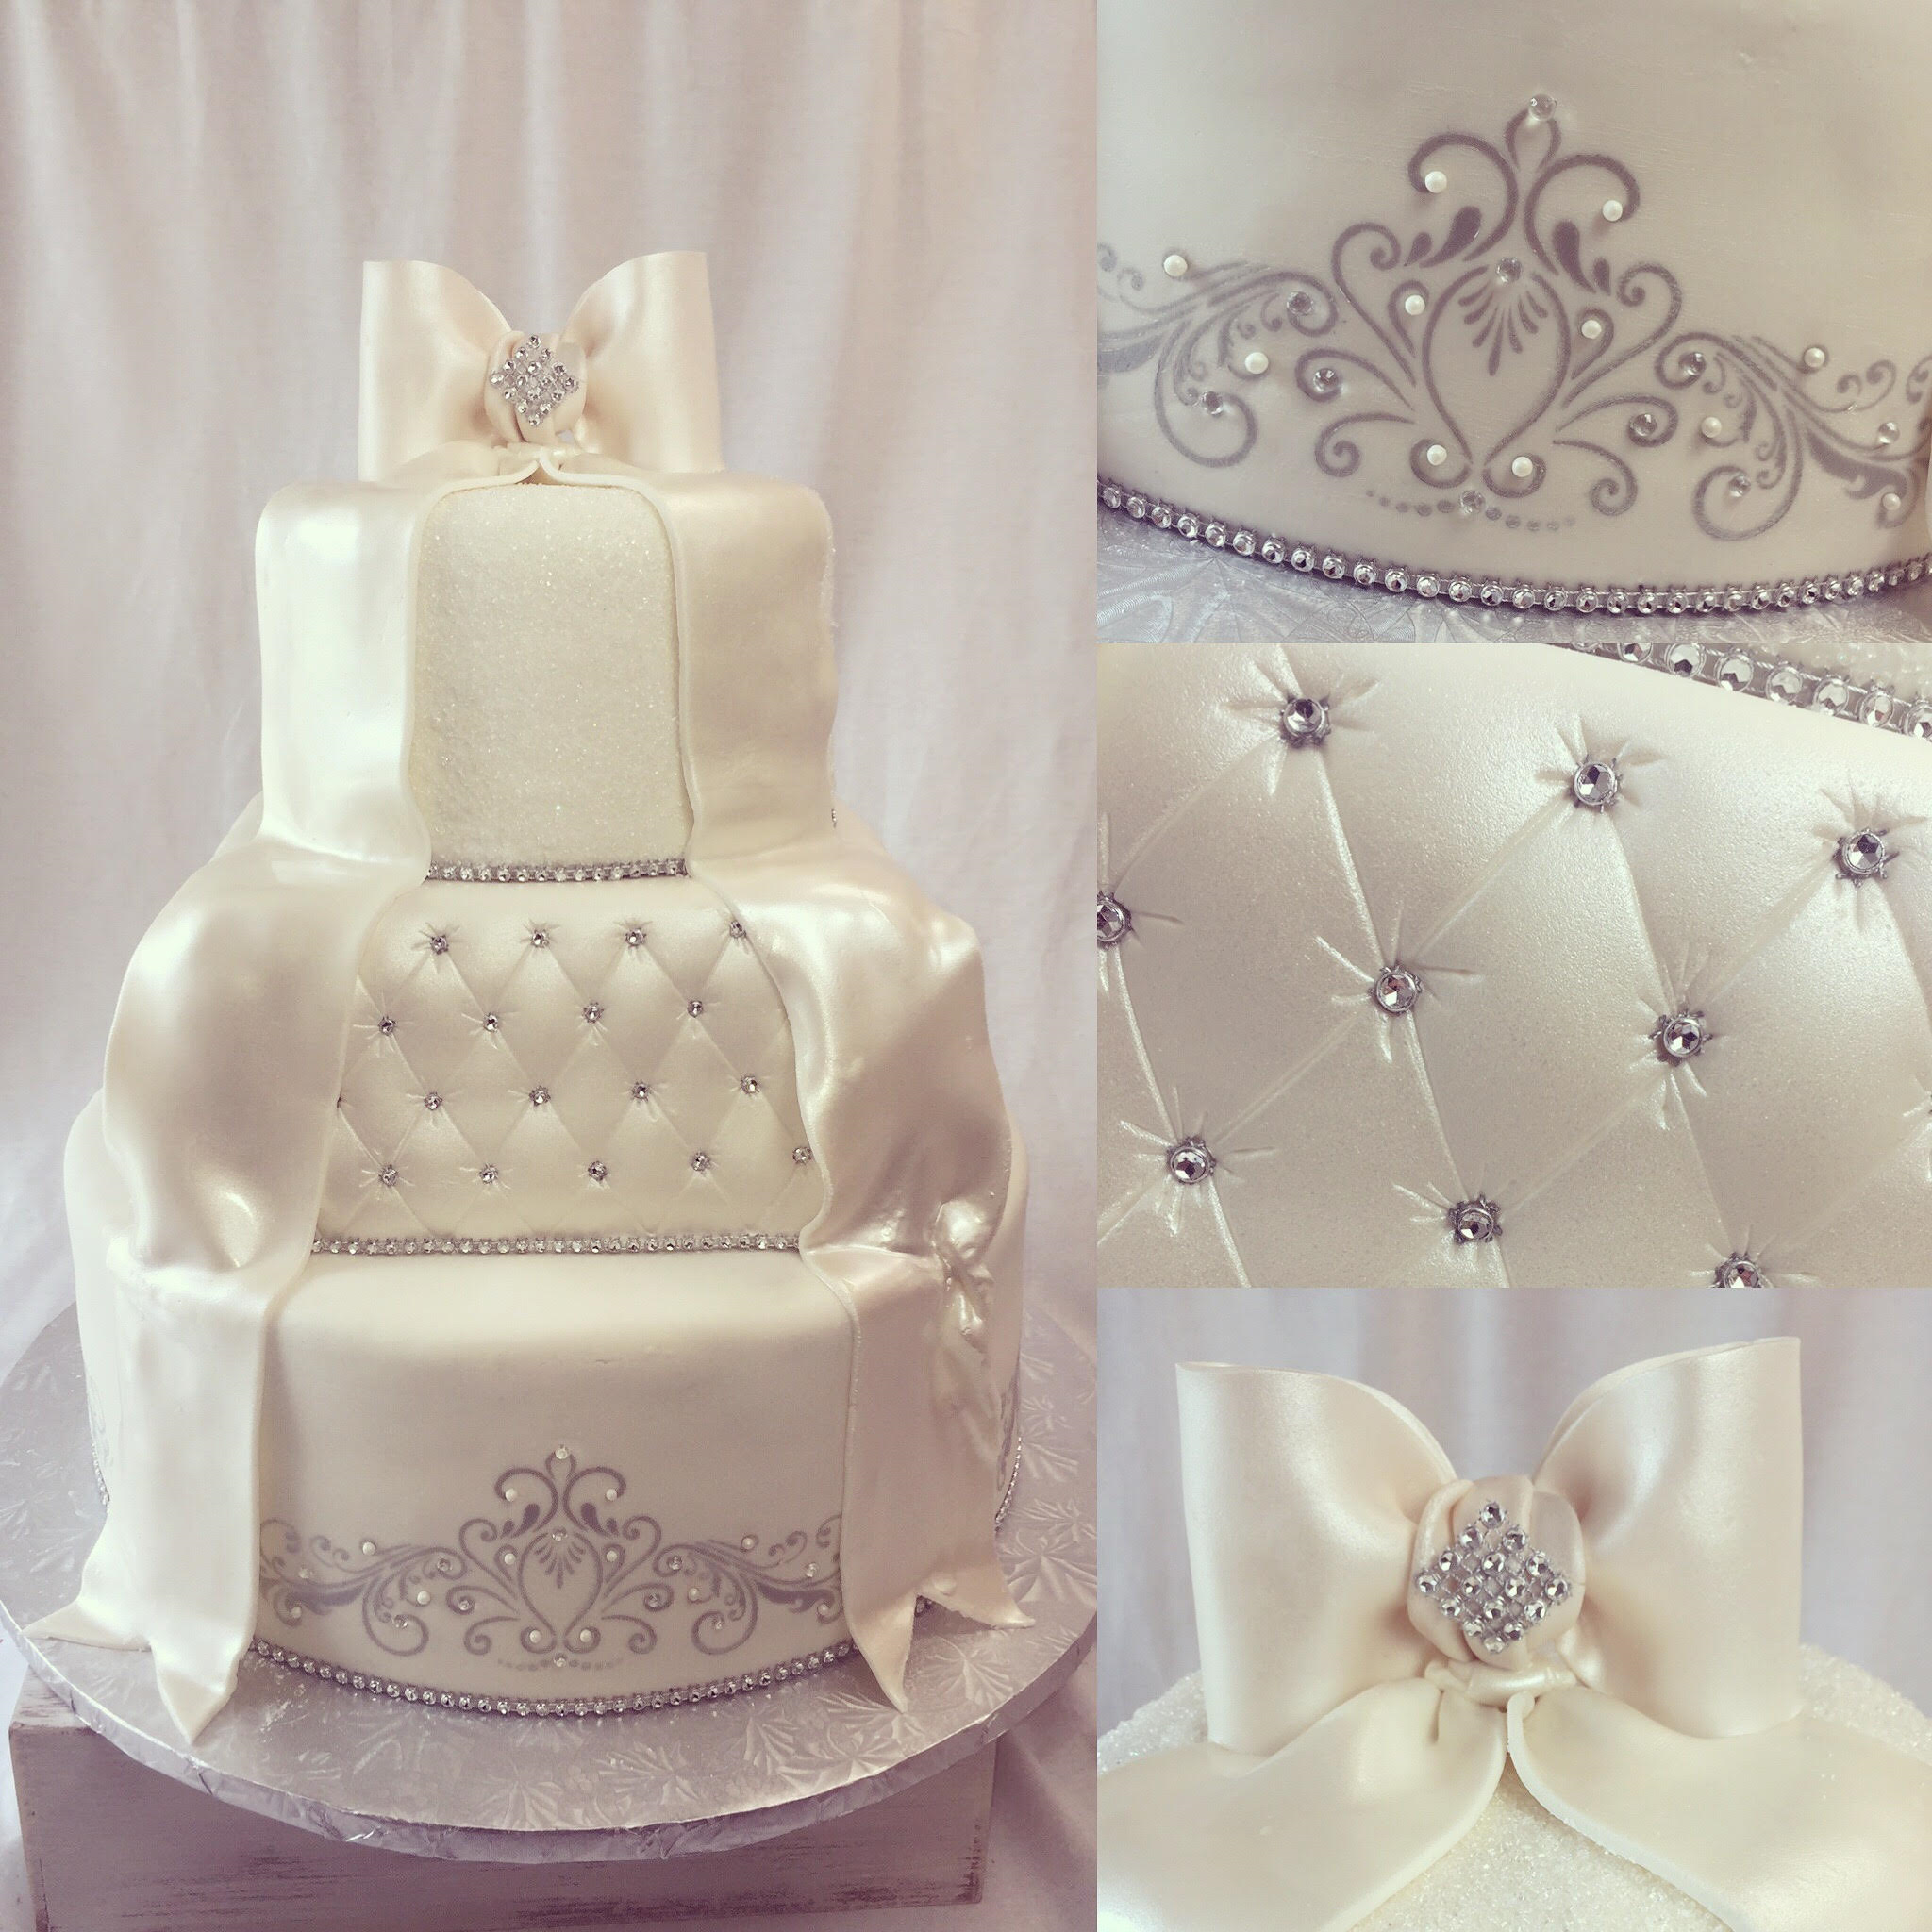 Wedding Cake Bakeries in Atlanta, GA - The Knot